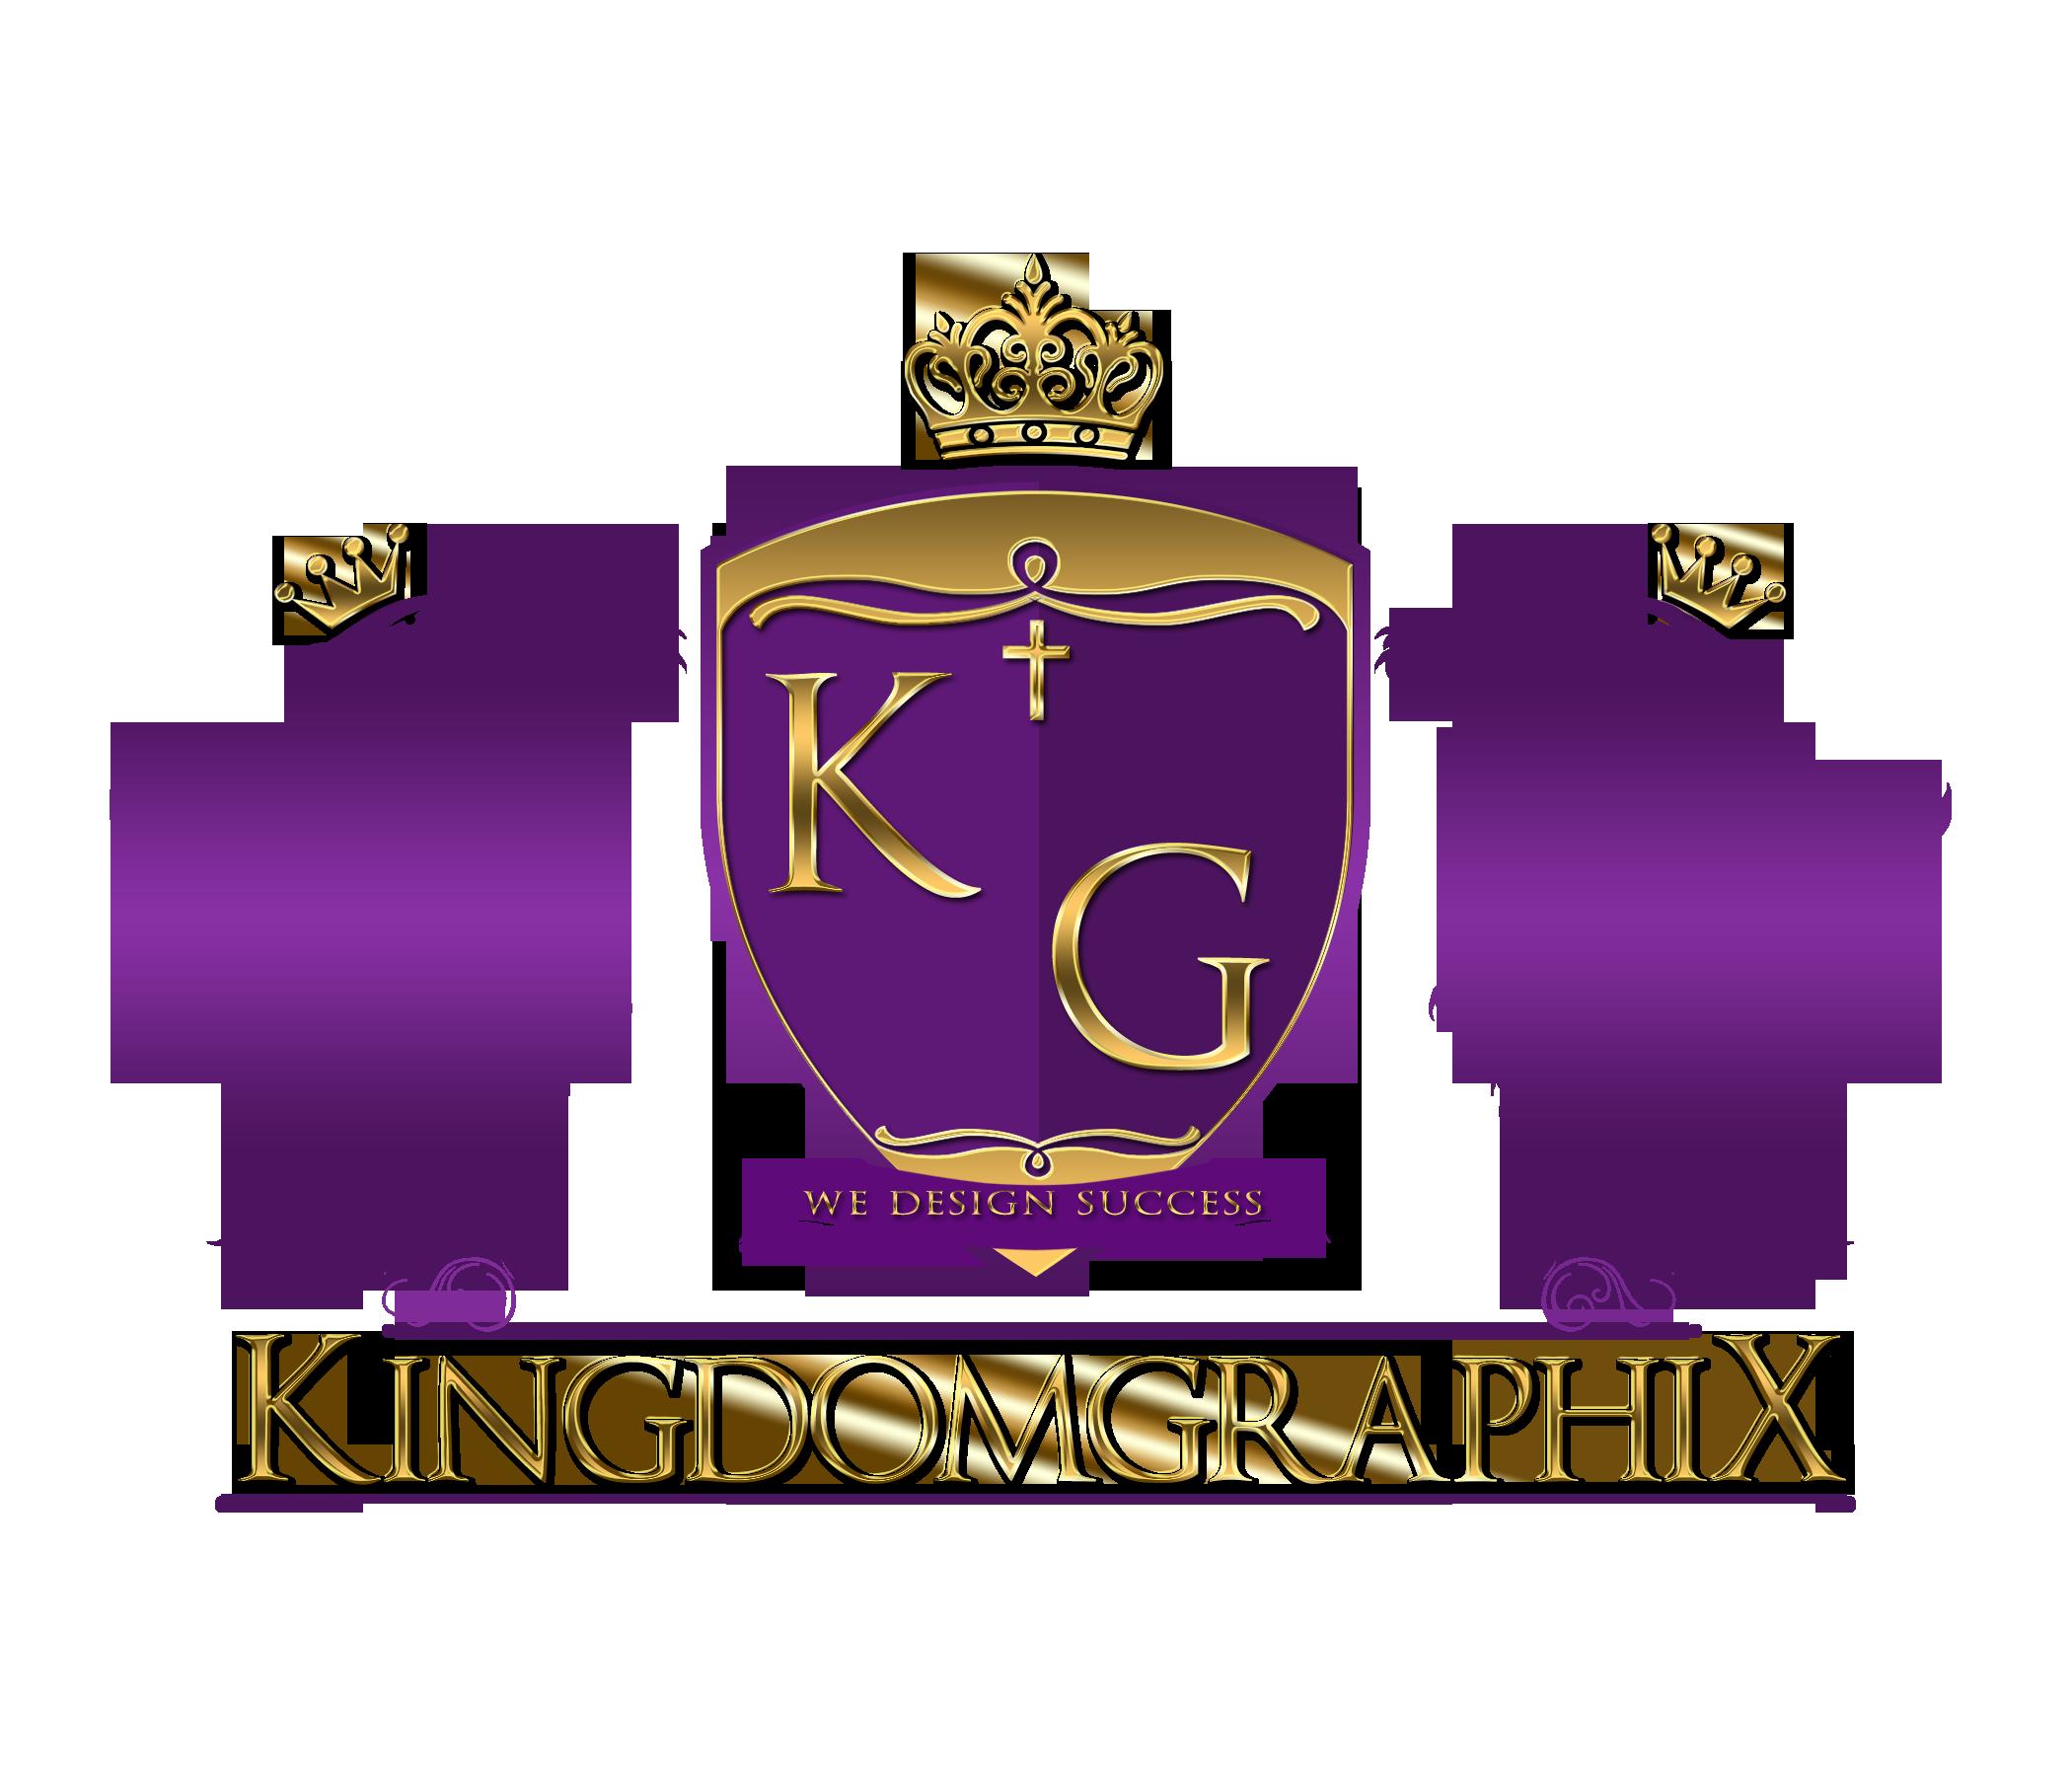 Kingdom Graphix Logo 2014 copy